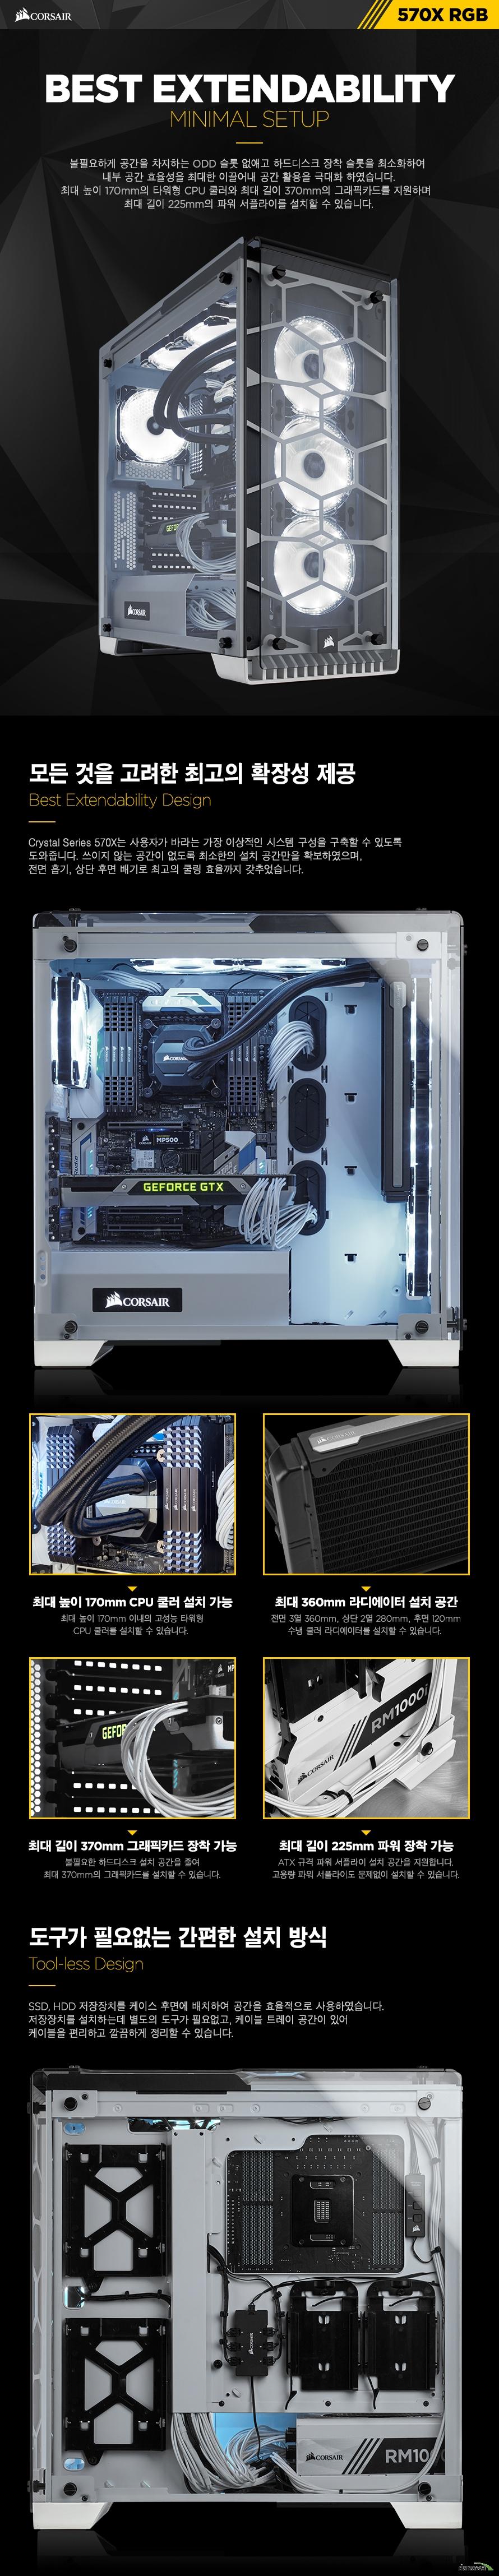 best extendability불필요하게 공간을 차지하는 ODD 슬롯 없애고 하드디스크 장착 슬롯을 최소화하여 내부 공간 효율성을 최대한 이끌어내 공간 활용을 극대화 하였습니다.최대 높이 170mm의 타워형 CPU 쿨러와 최대 길이 370mm의 그래픽카드를 지원하며  최대 길이 225mm의 파워 서플라이를 설치할 수 있습니다.모든 것을 고려한 최고의 확장성 제공커세어 크리스탈 시리즈 570X는 사용자가 바라는 가장 이상적인 시스템 구성을 구축할 수 있도록 도와줍니다. 쓰이지 않는 공간이 없도록 최소한의 설치 공간만을 확보하였으며, 전면 흡기, 상단 후면 배기로 최고의 쿨링 효율까지 갖추었습니다. 최대 높이 170mm CPU 쿨러 설치 가능최대 높이 170mm 이내의 고성능 타워형CPU 쿨러를 설치할 수 있습니다. 최대 360mm 라디에이터 설치 공간전면 3열 360mm, 상단 2열 280mm, 후면 120mm수냉 쿨러 라디에이터를 설치할 수 있습니다. 최대 길이 370mm 그래픽카드 장착 가능불필요한 하드디스크 설치 공간을 줄여최대 370mm의 그래픽카드를 설치할 수 있습니다.최대 길이 225mm 파워 장착 가능ATX 규격 파워 서플라이 설치 공간을 지원합니다.고용량 파워 서플라이도 문제없이 설치할 수 있습니다.도구가 필요없는 간편한 설치 방식SSD, HDD 저장장치를 케이스후면에 배치하여 공간을 효율적으로 사용하였습니다.저장장치를 설치하는데 별도의 도구가 필요없고, 케이블 트레이 공간이 있어케이블을 편리하고 깔끔하게 정리할 수 있습니다.